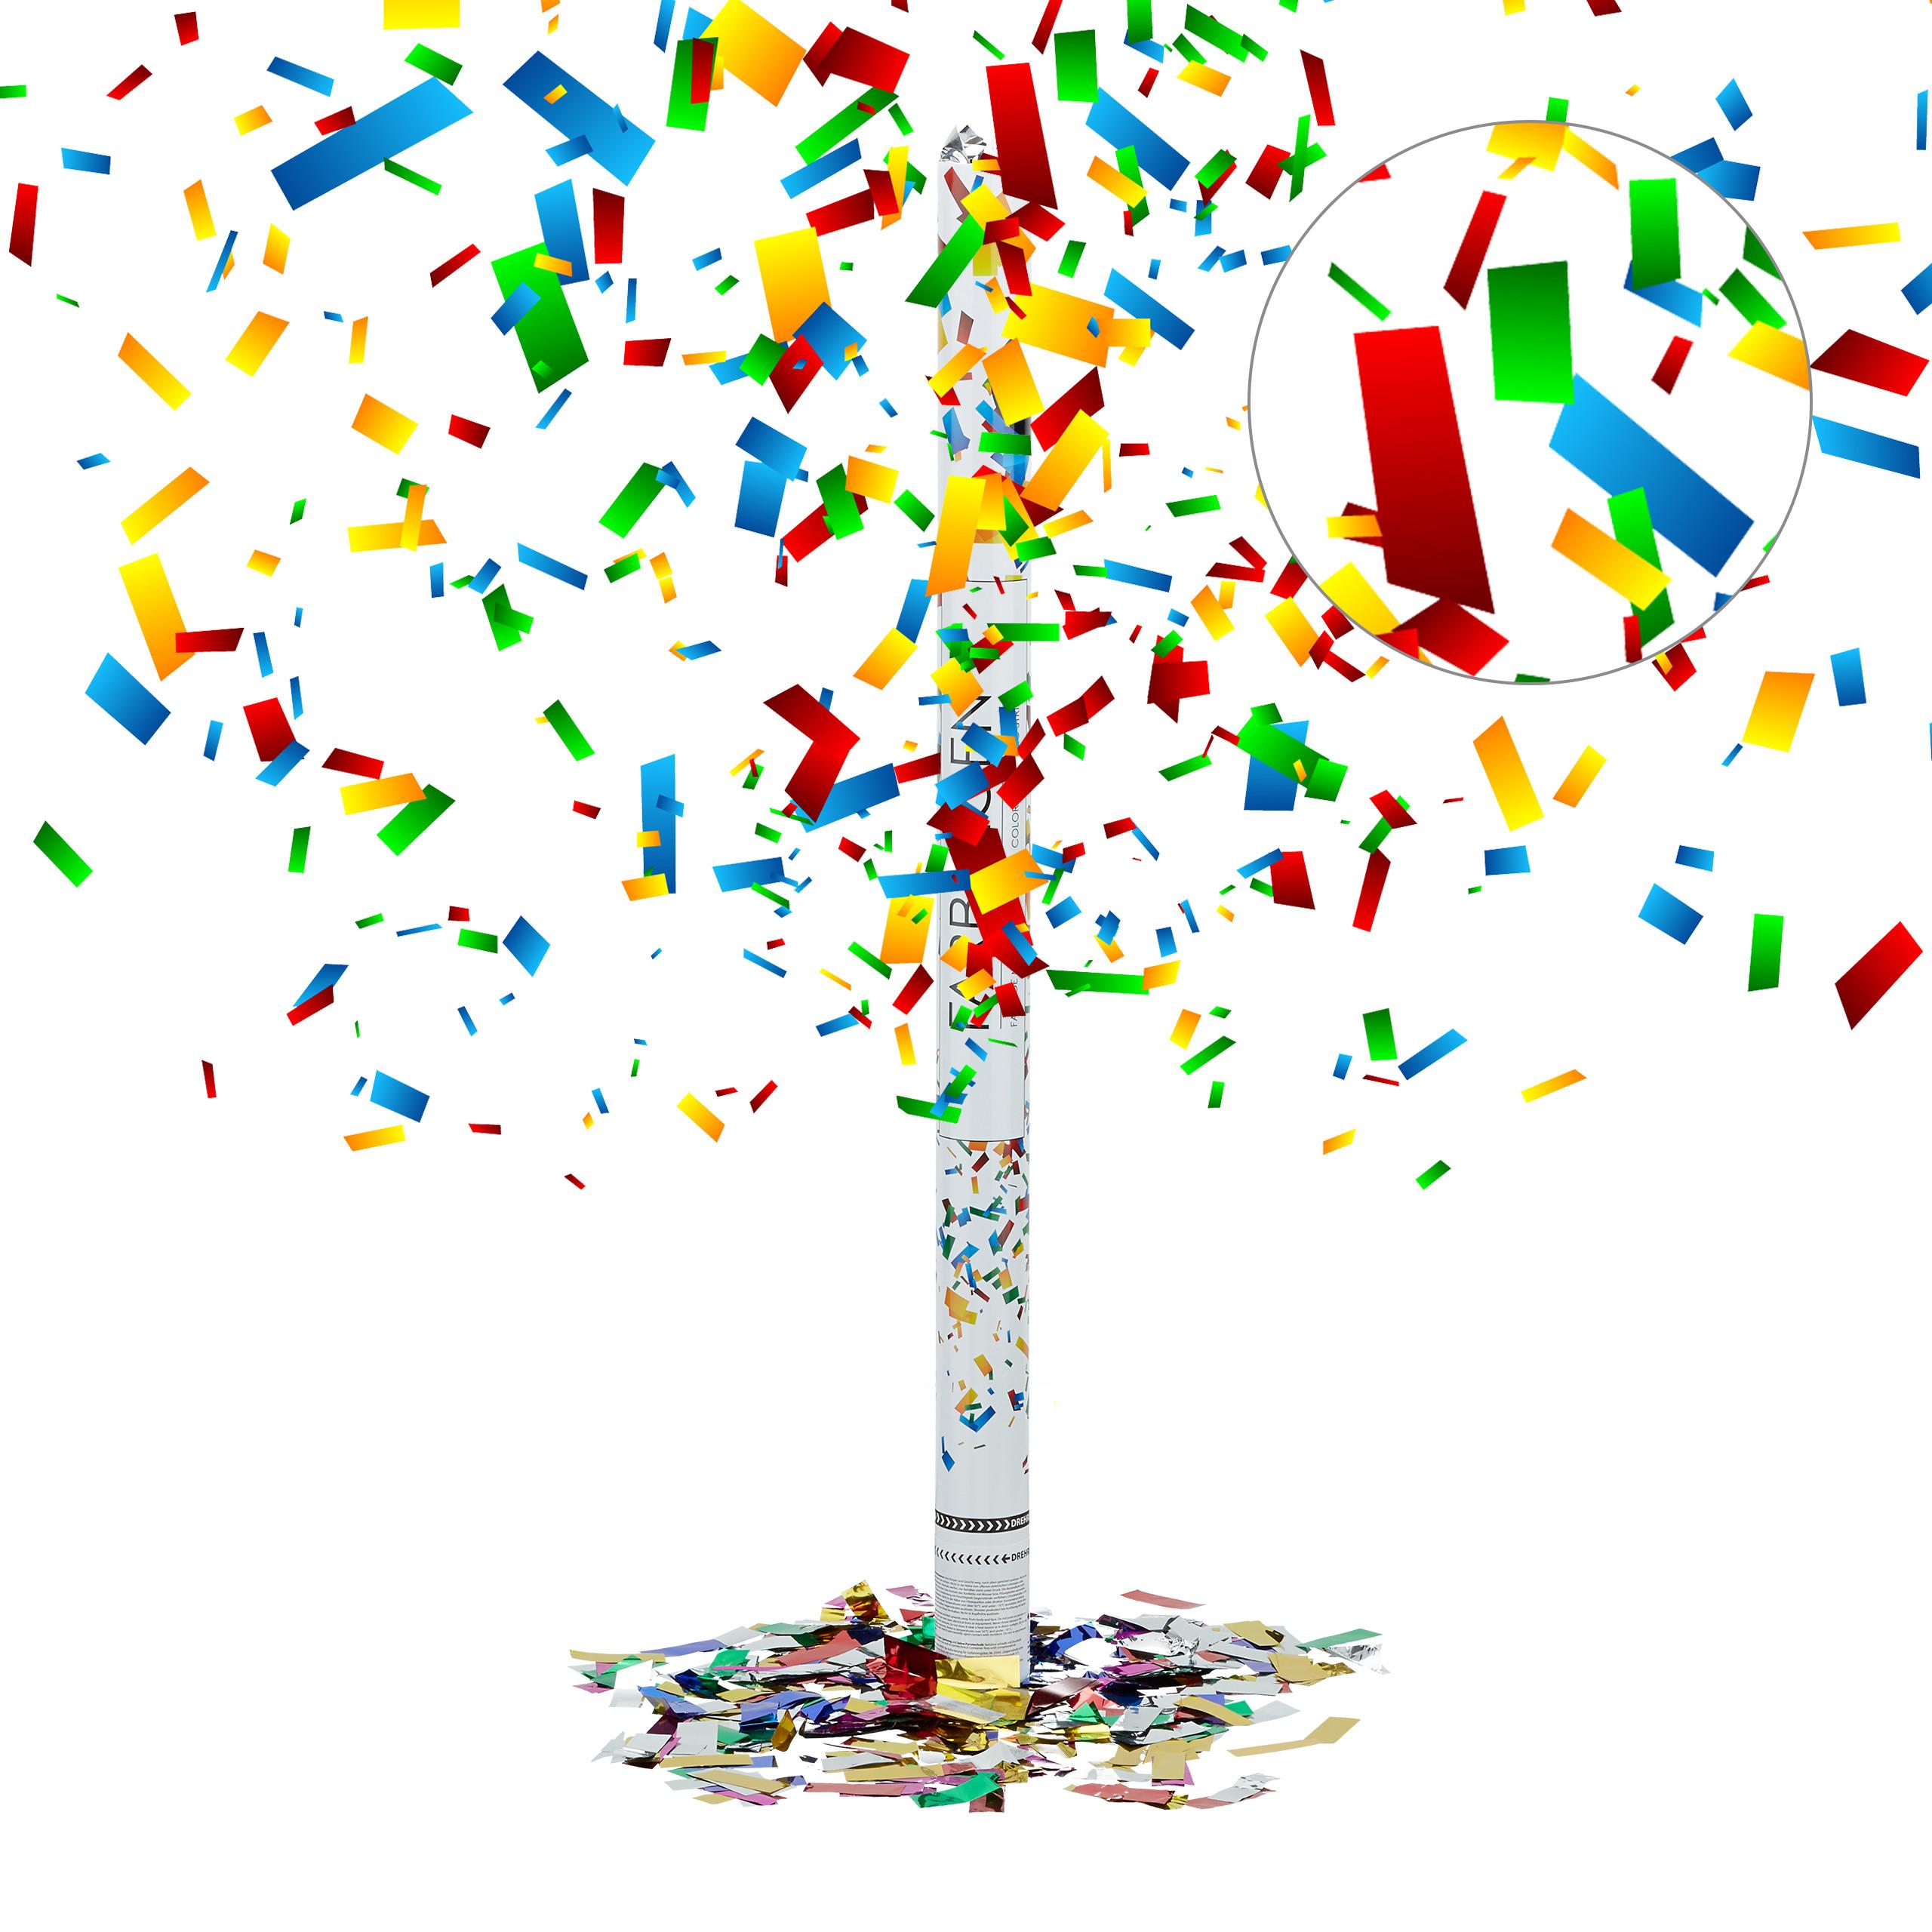 Konfetti Party 5m Effekth/öhe Private Partys Konfeti Private Feiern Konfettikanone f/ür Silvester Geburtstag Konfetti-Kanone Party-Popper 30 cm SILBER Confetti 1 Konfetti-Shooter